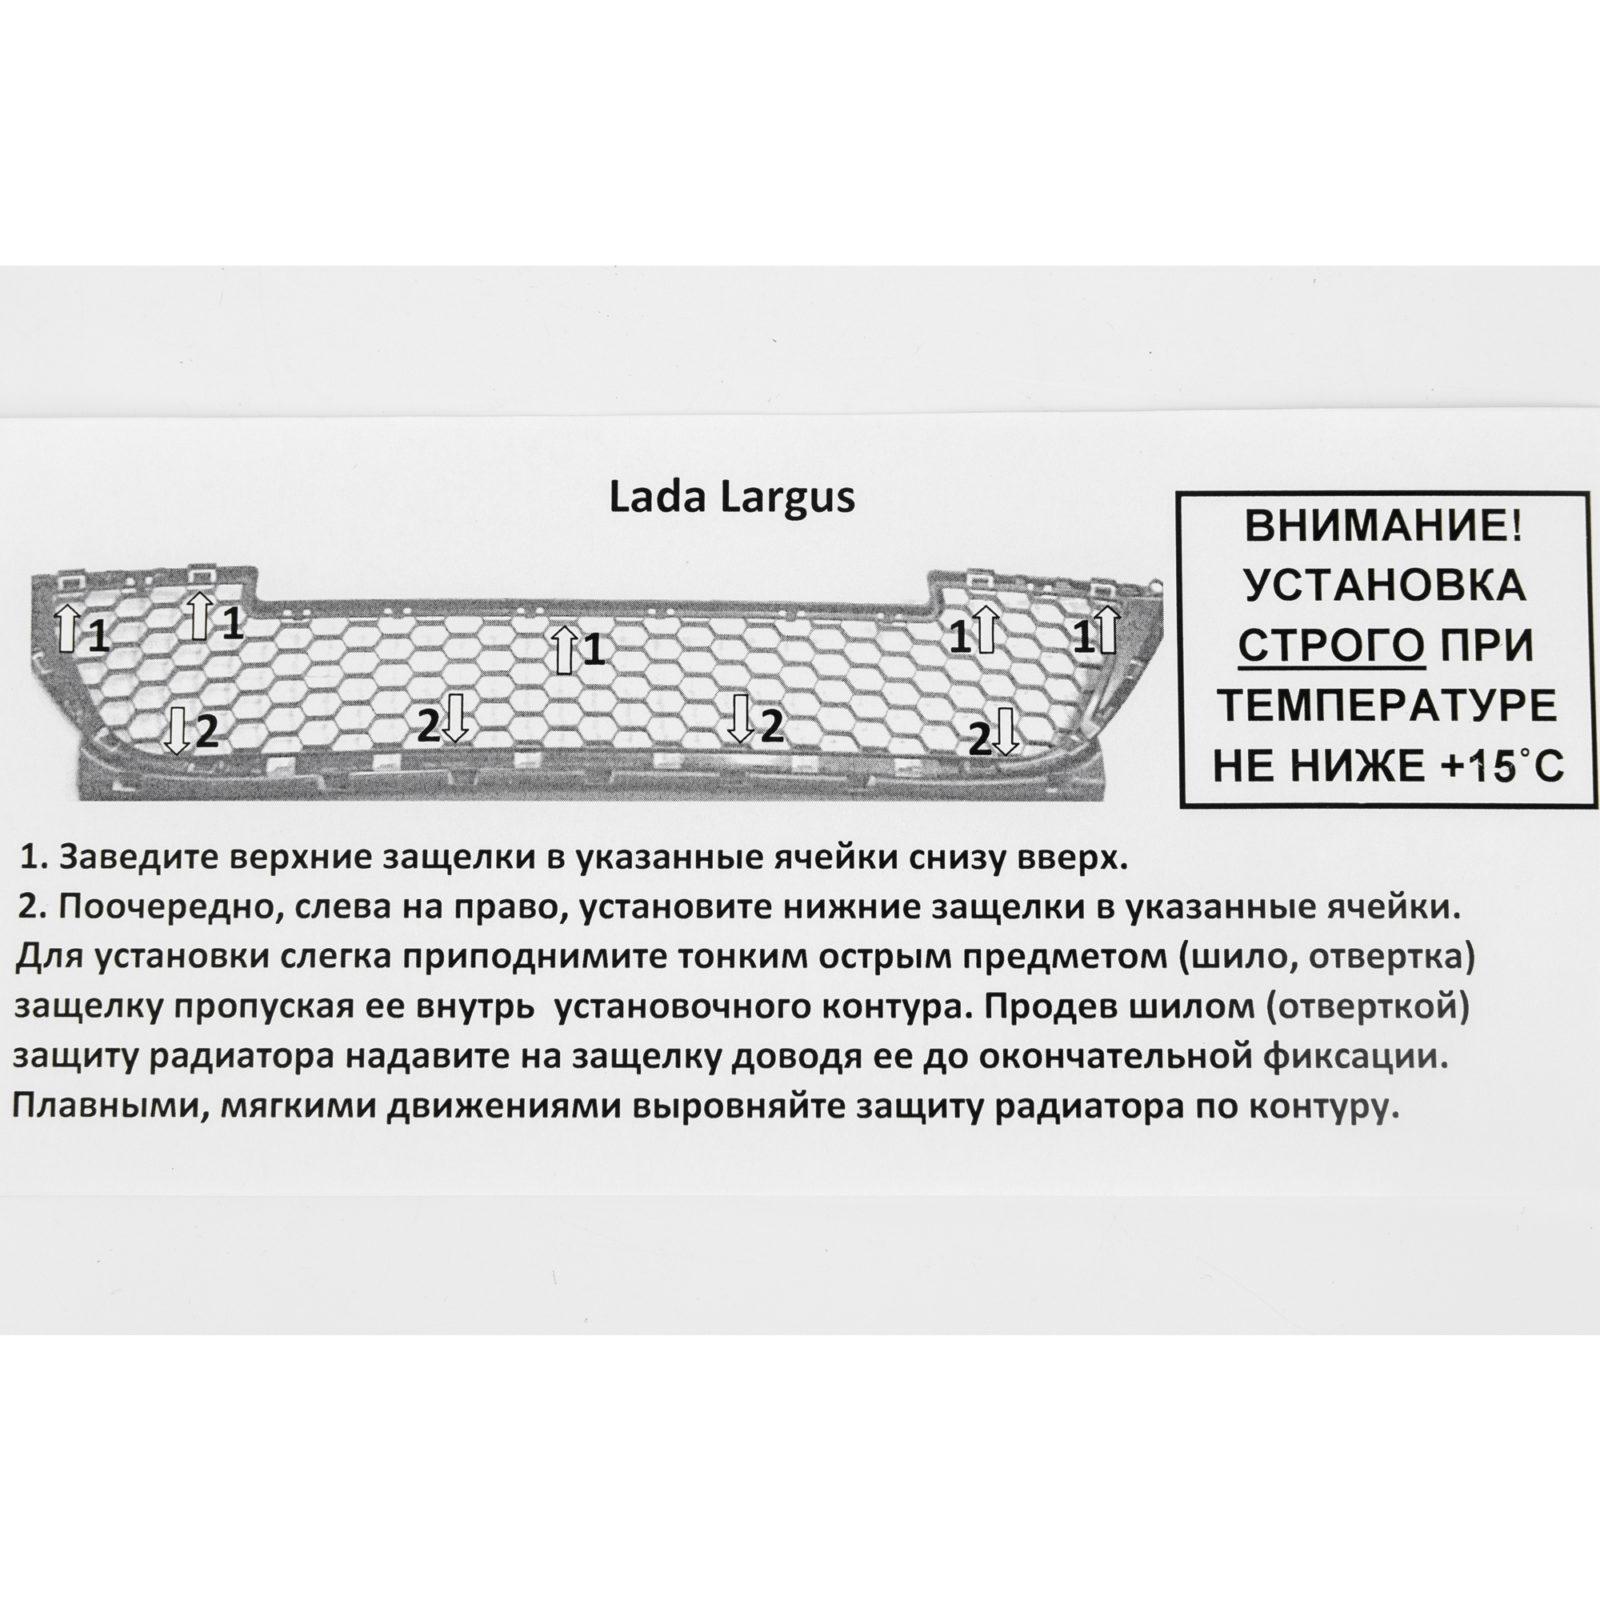 Защита радиатора для LADA Largus, chrome низ